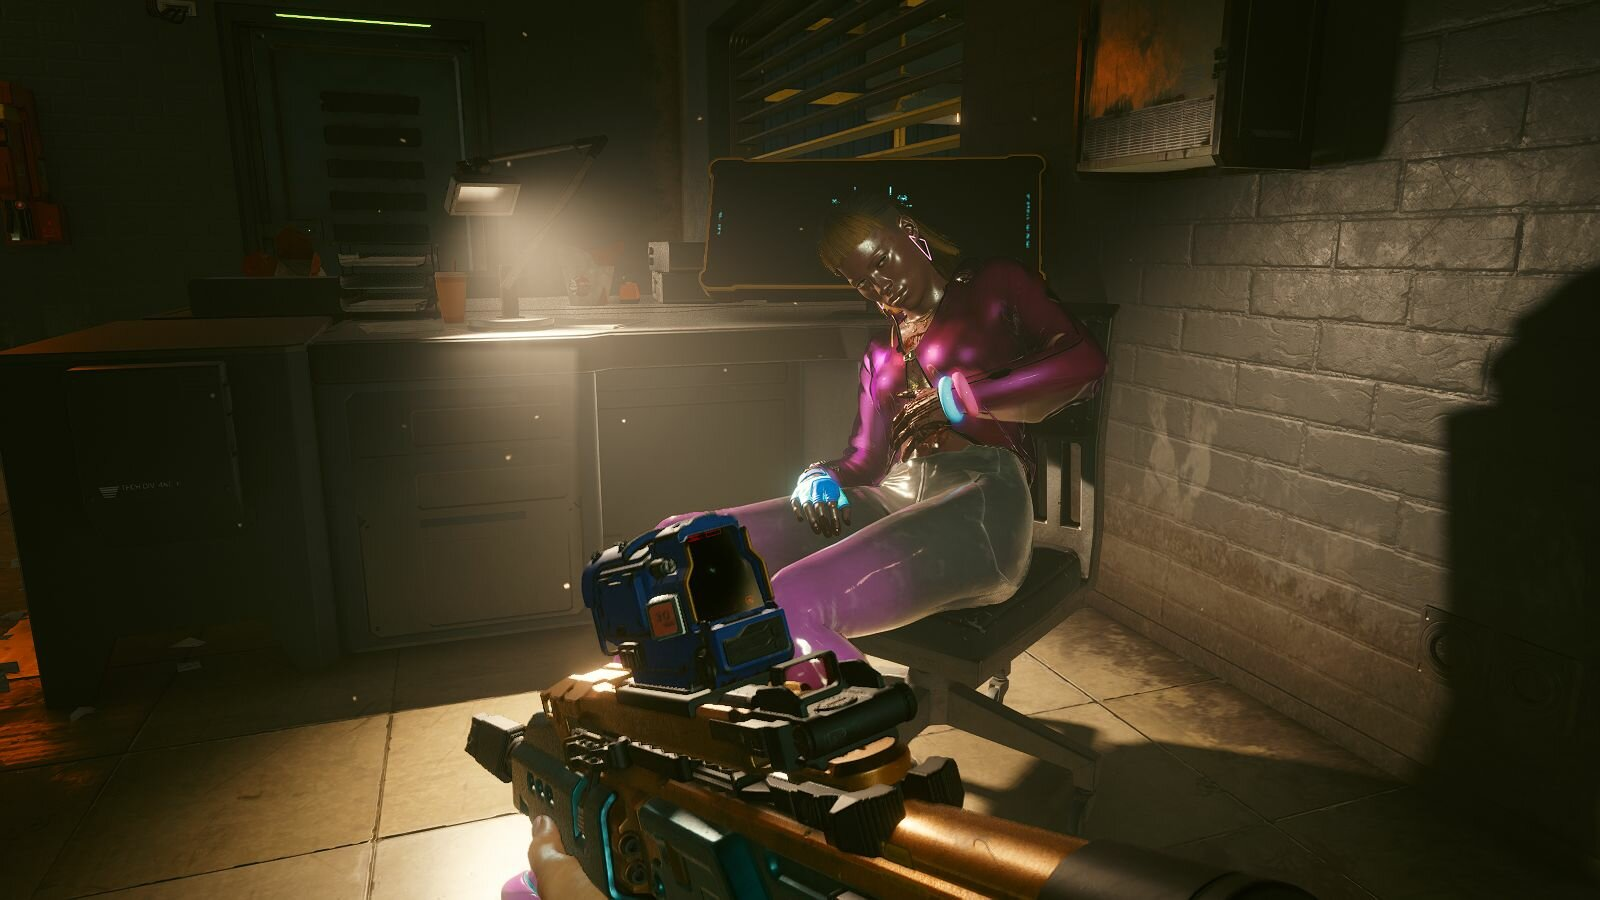 Подпорченная девица. Cyberpunk 2077